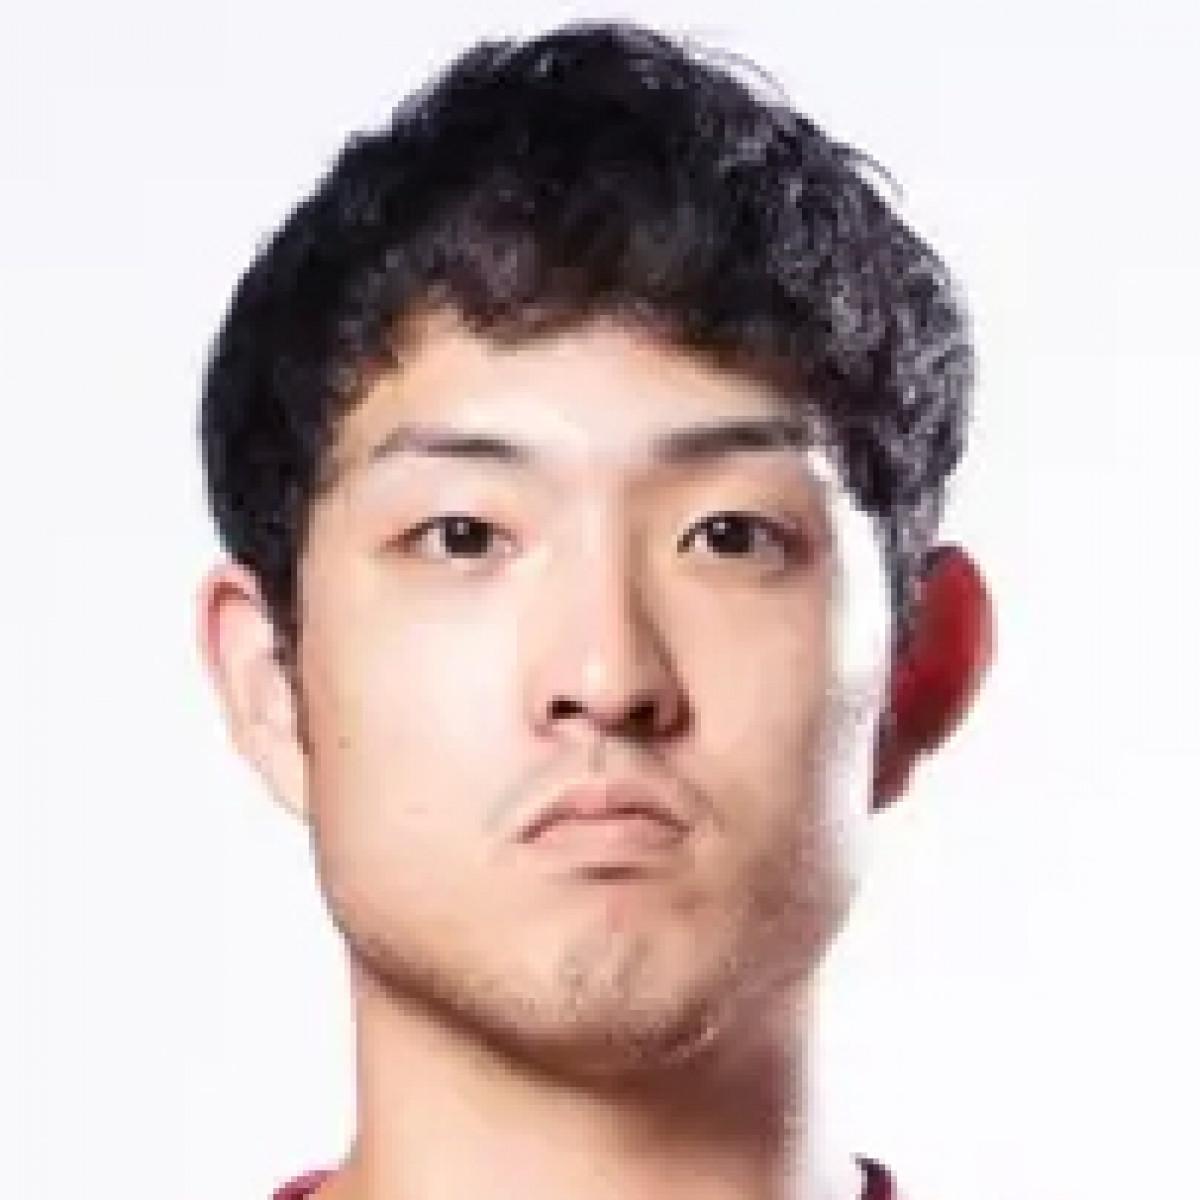 Kensuke Tamai